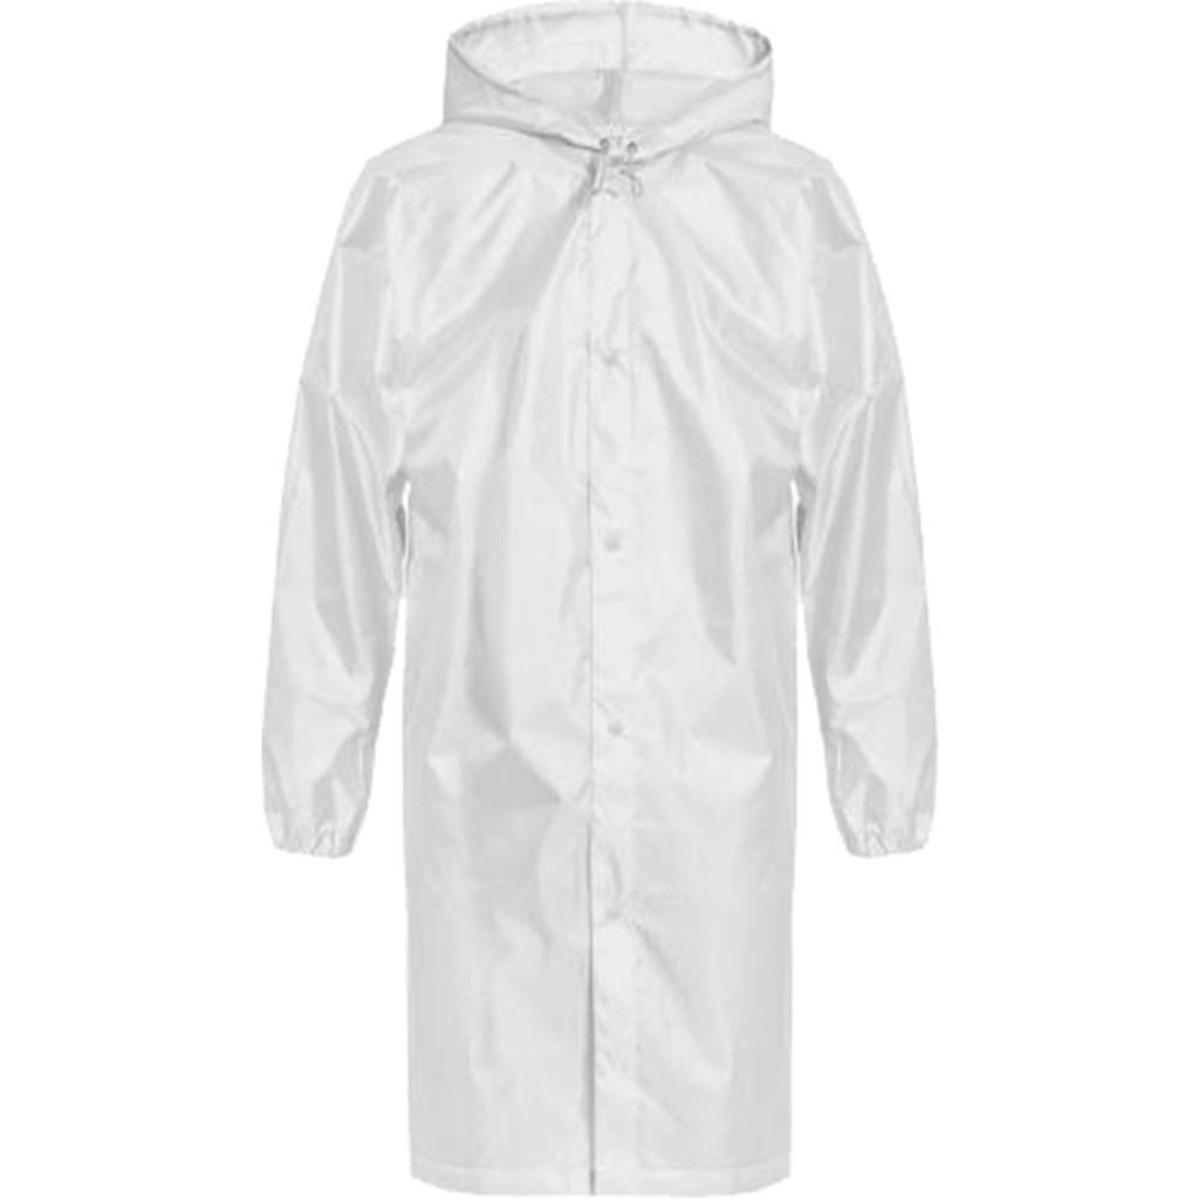 Дождевик Hobocode Rainman Белый S